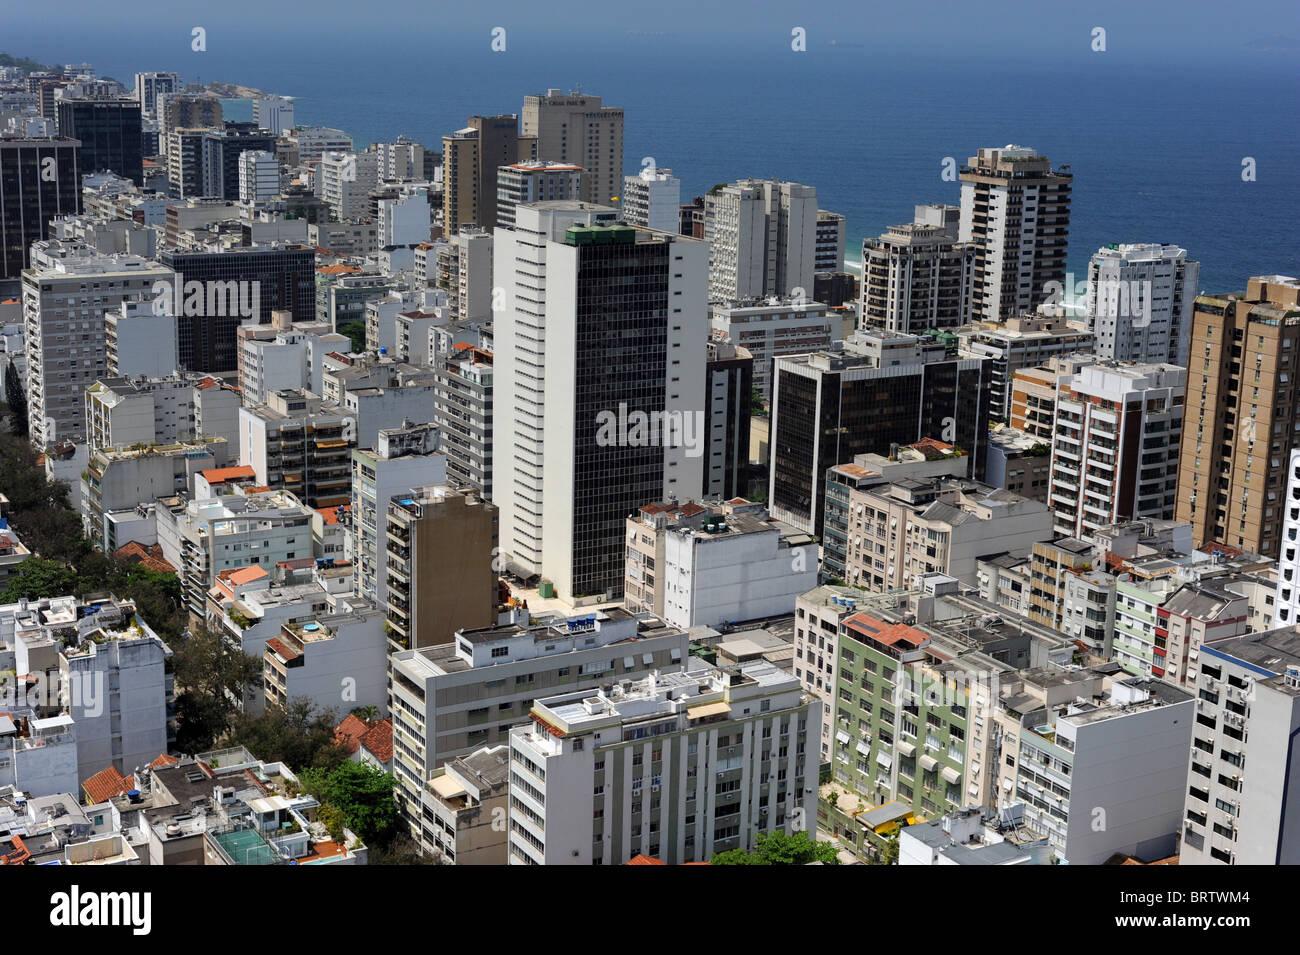 Aerial shot looking across the skyline of  Rio de Janerio - Stock Image